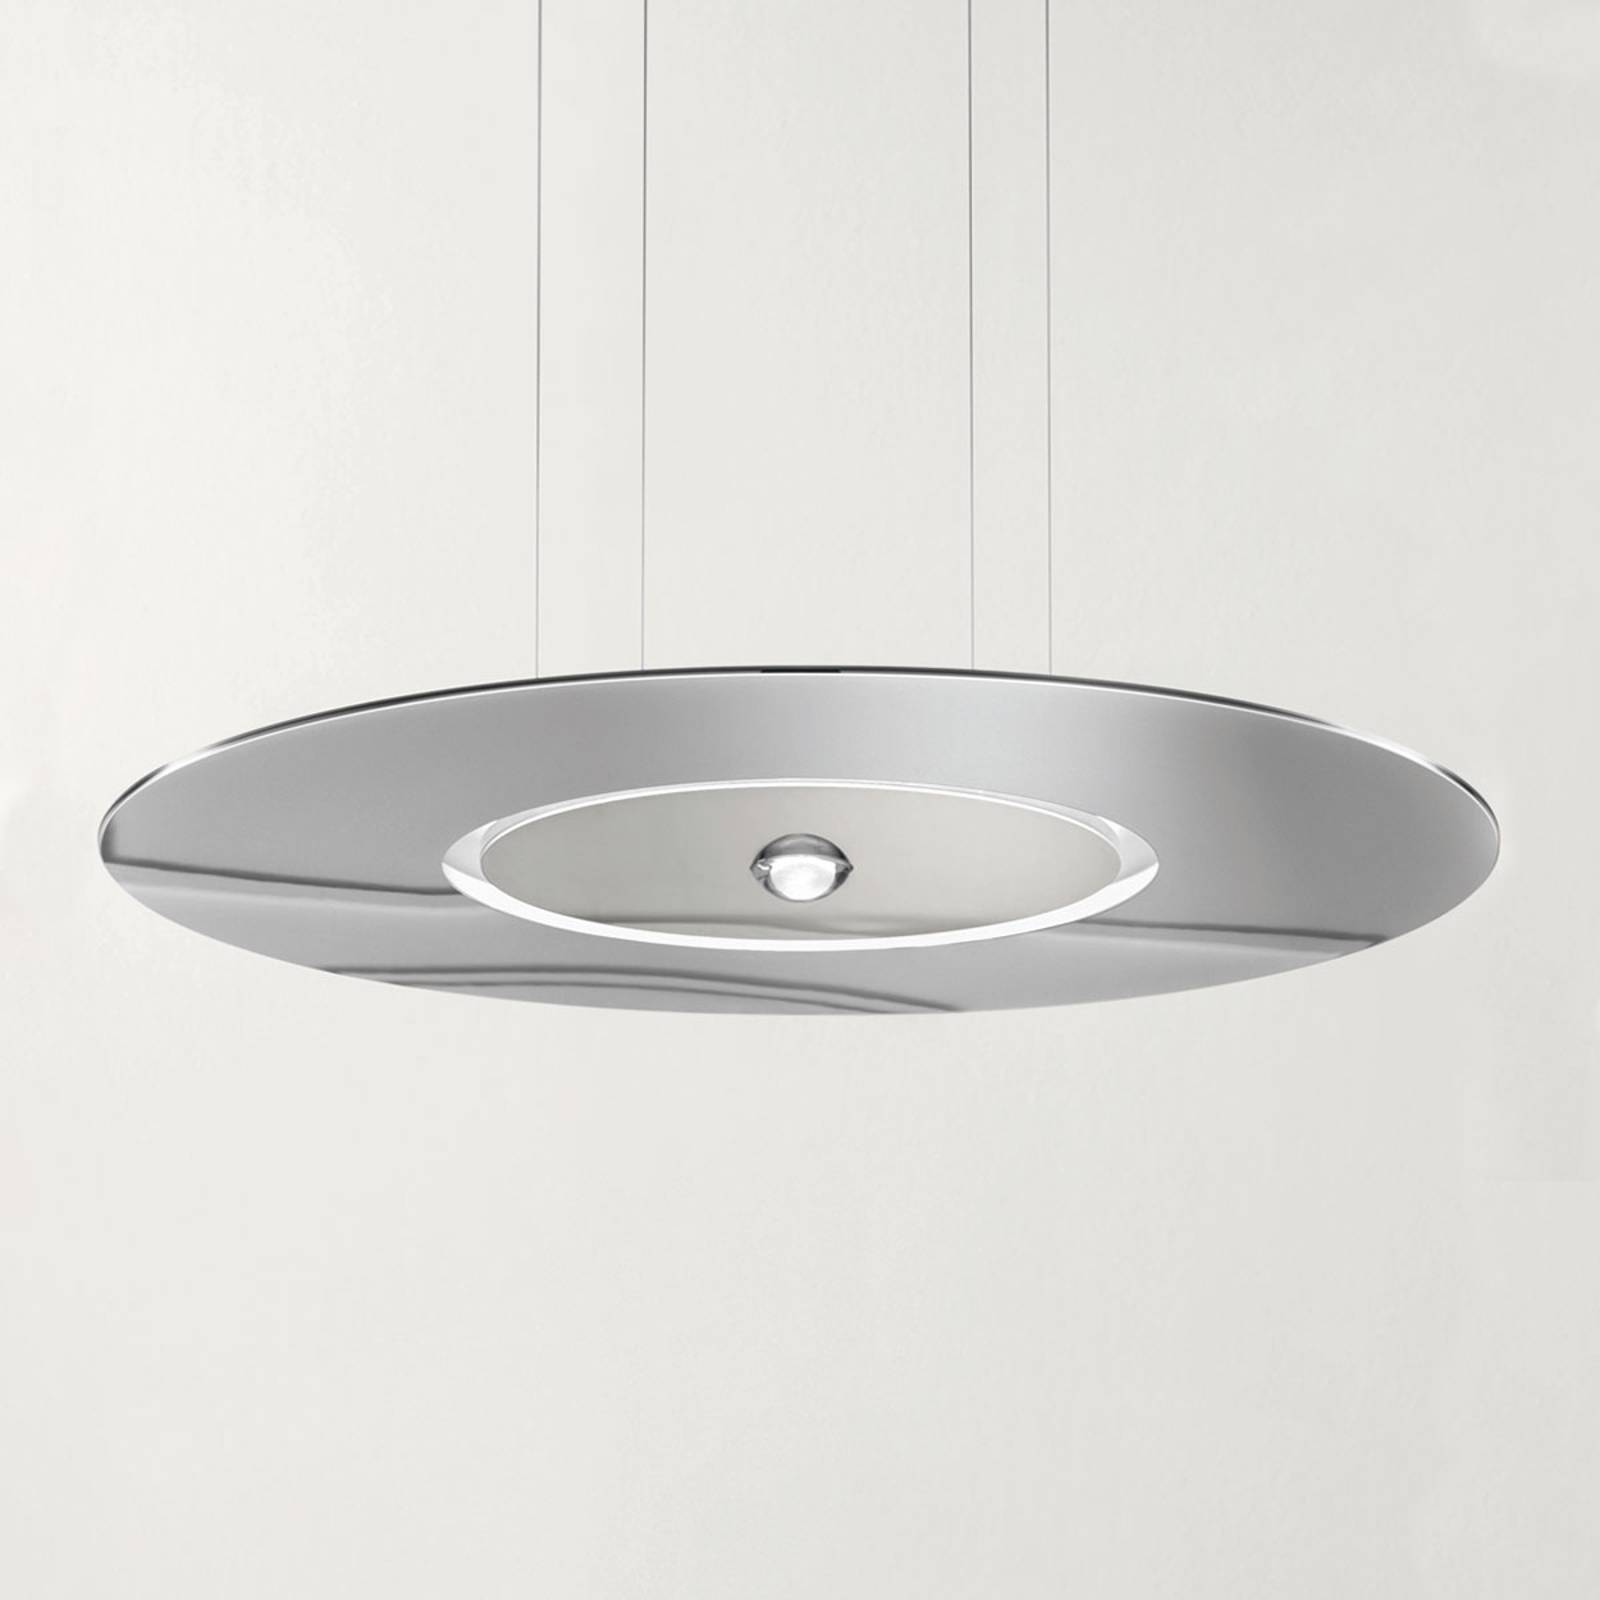 Cini&Nils Passepartout55 LED-Hängeleuchte chrom